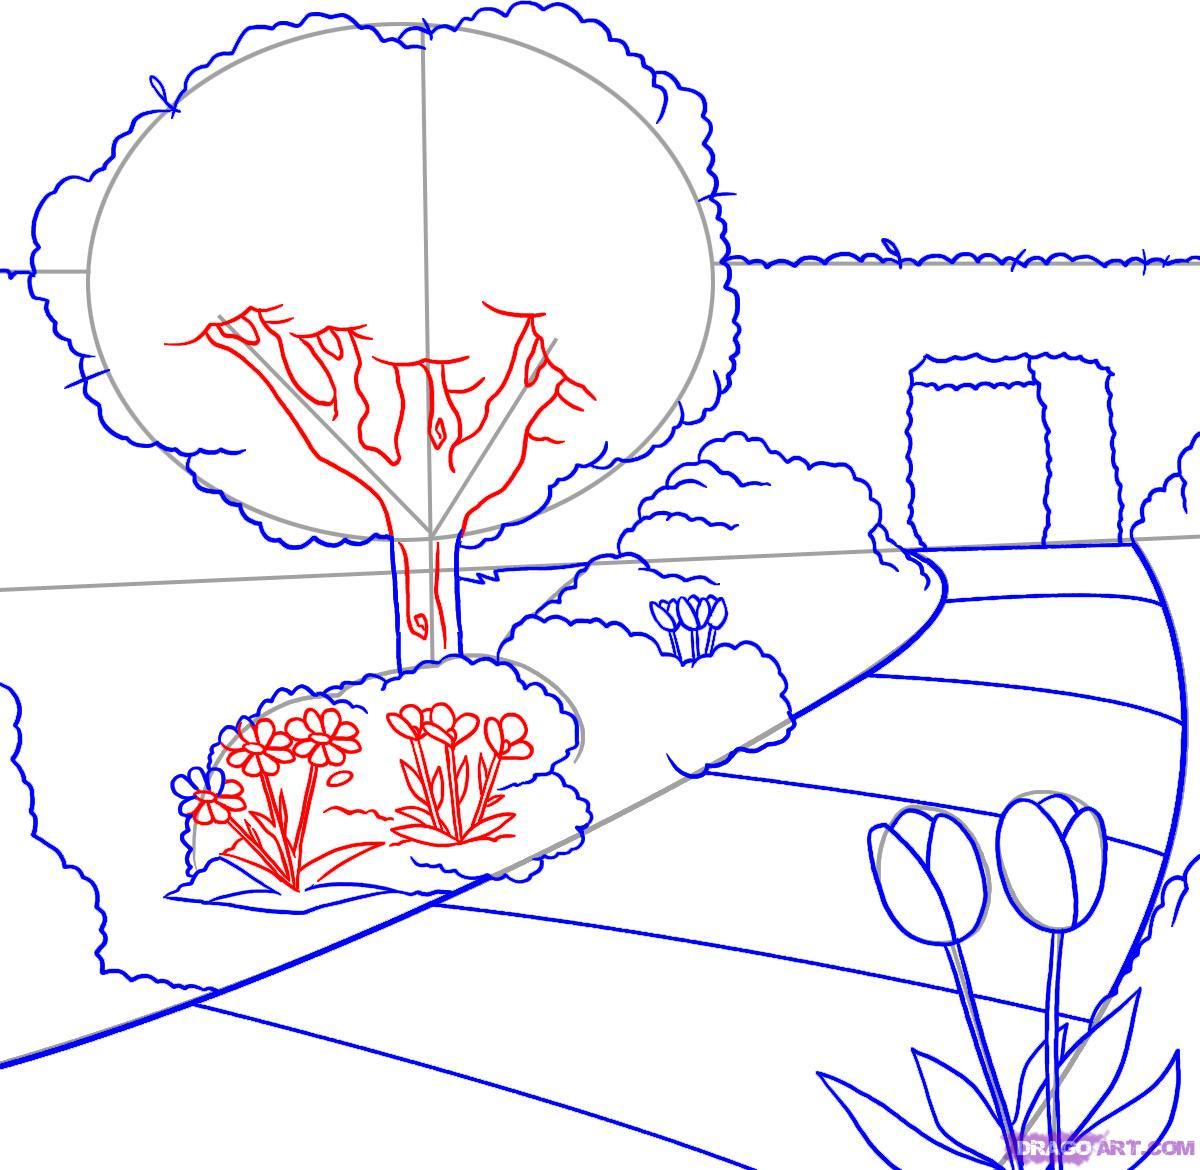 Drawn shrub step by step Draw how & to step